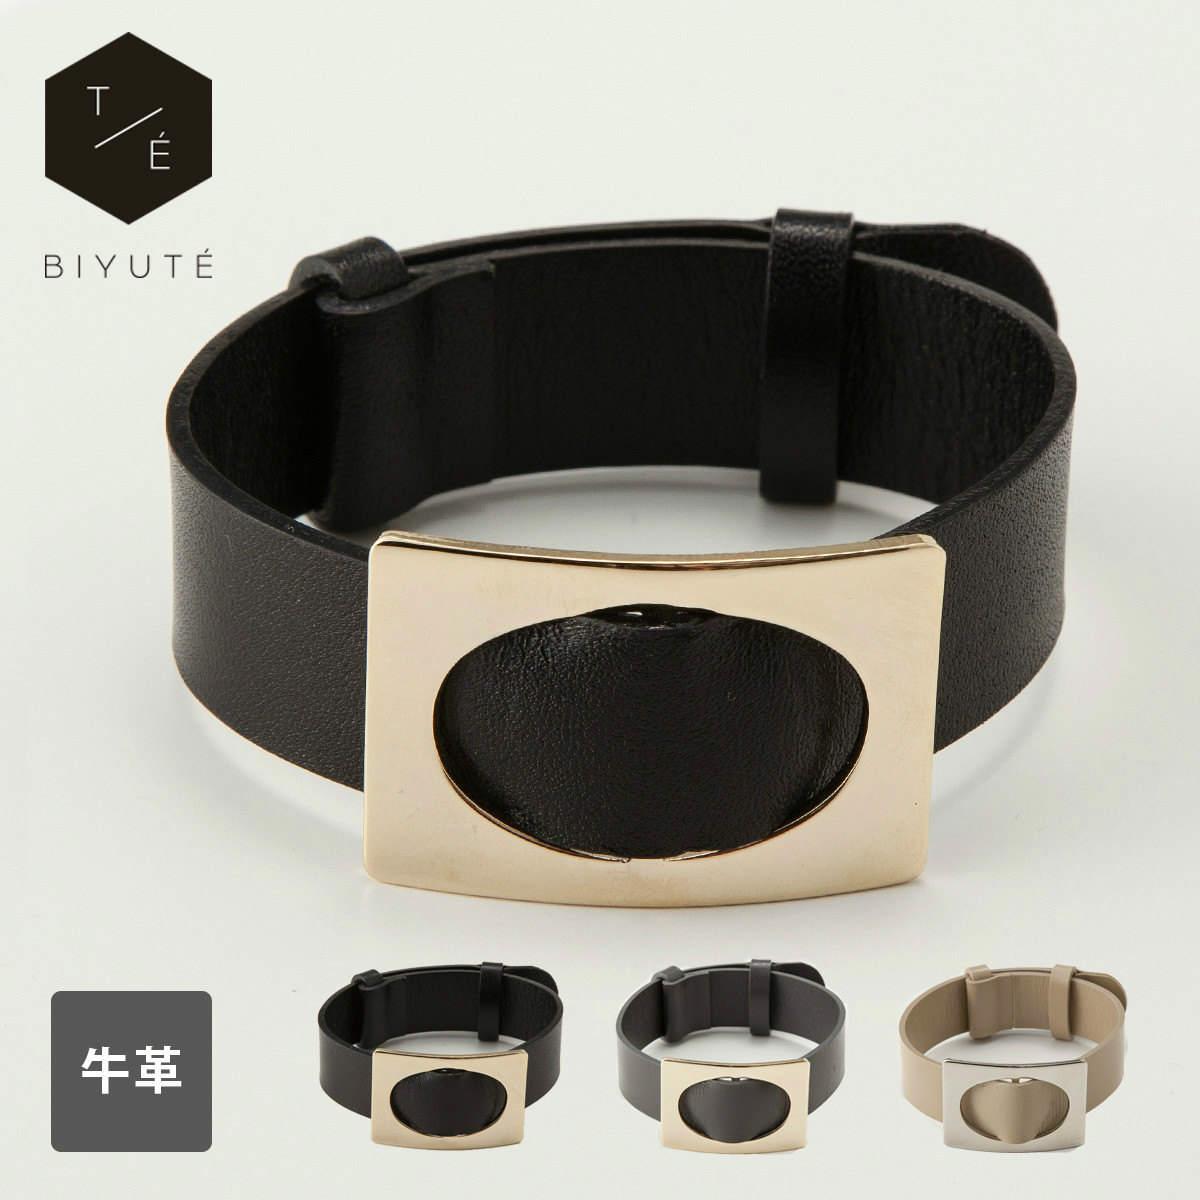 BIYUTE ハンドアクセサリー レザーバングル アームカフ シンプル メタルバックル 全3色